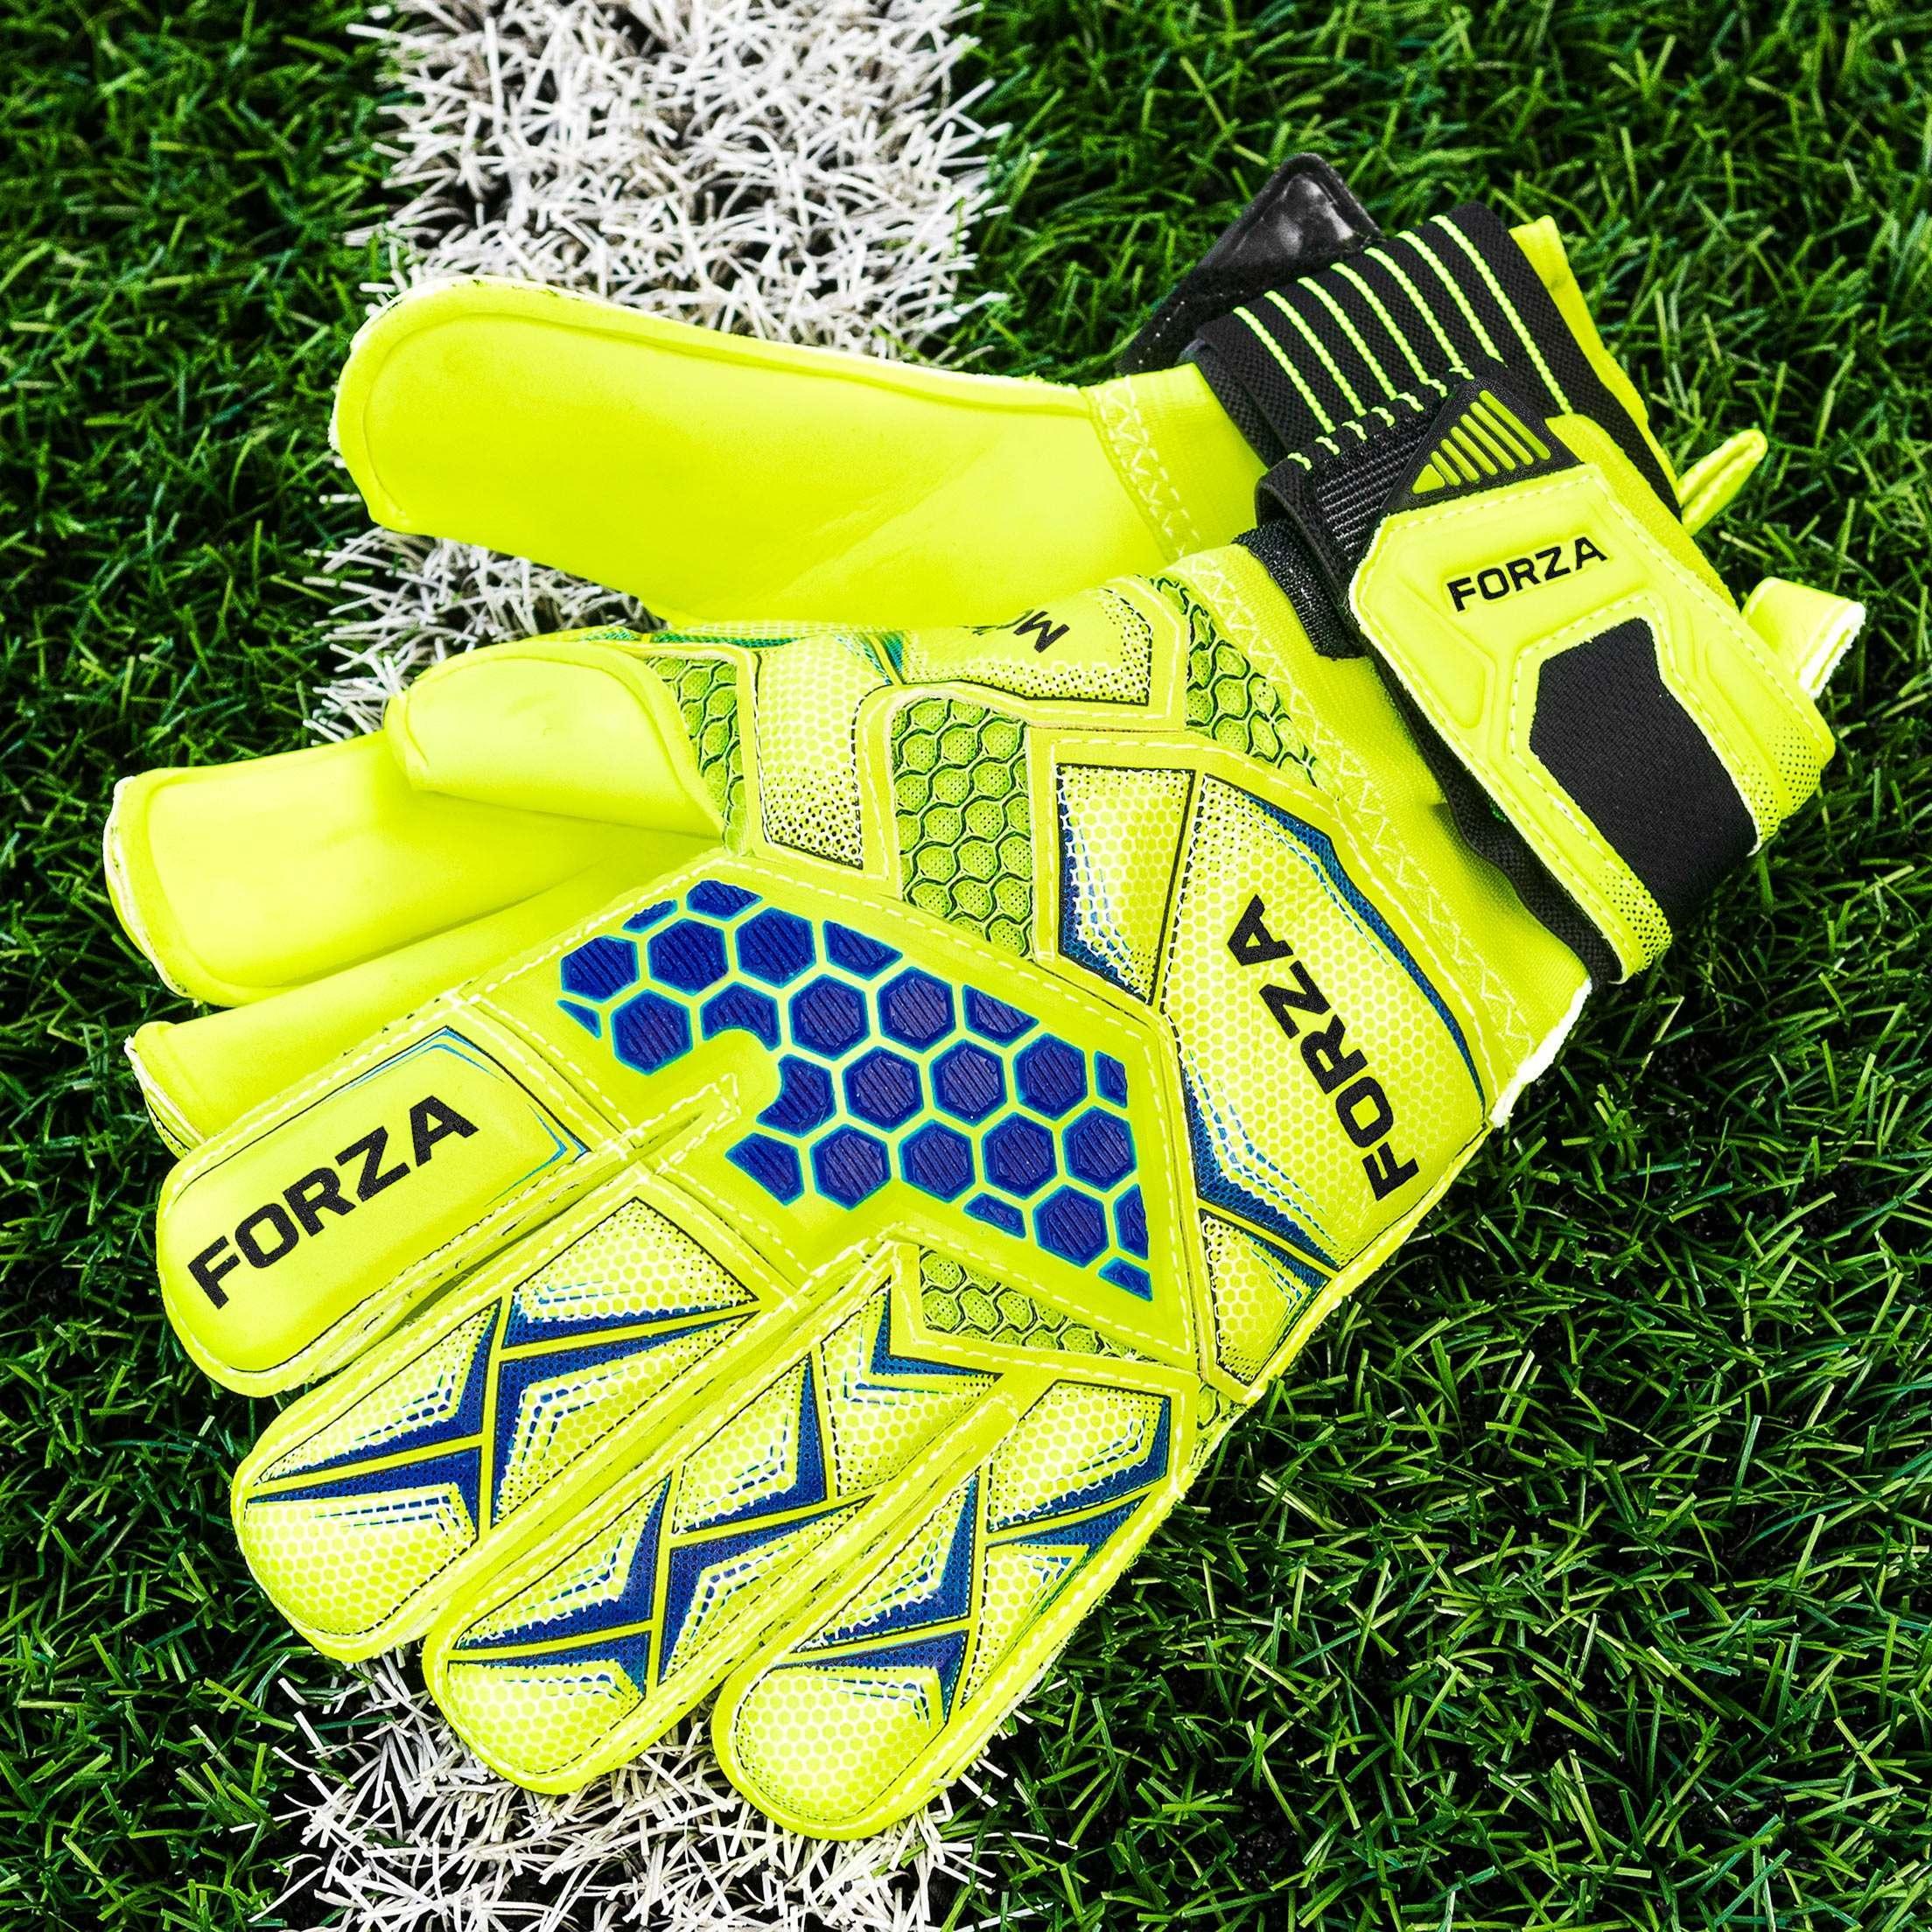 FORZA Mondo Goalkeeper Gloves